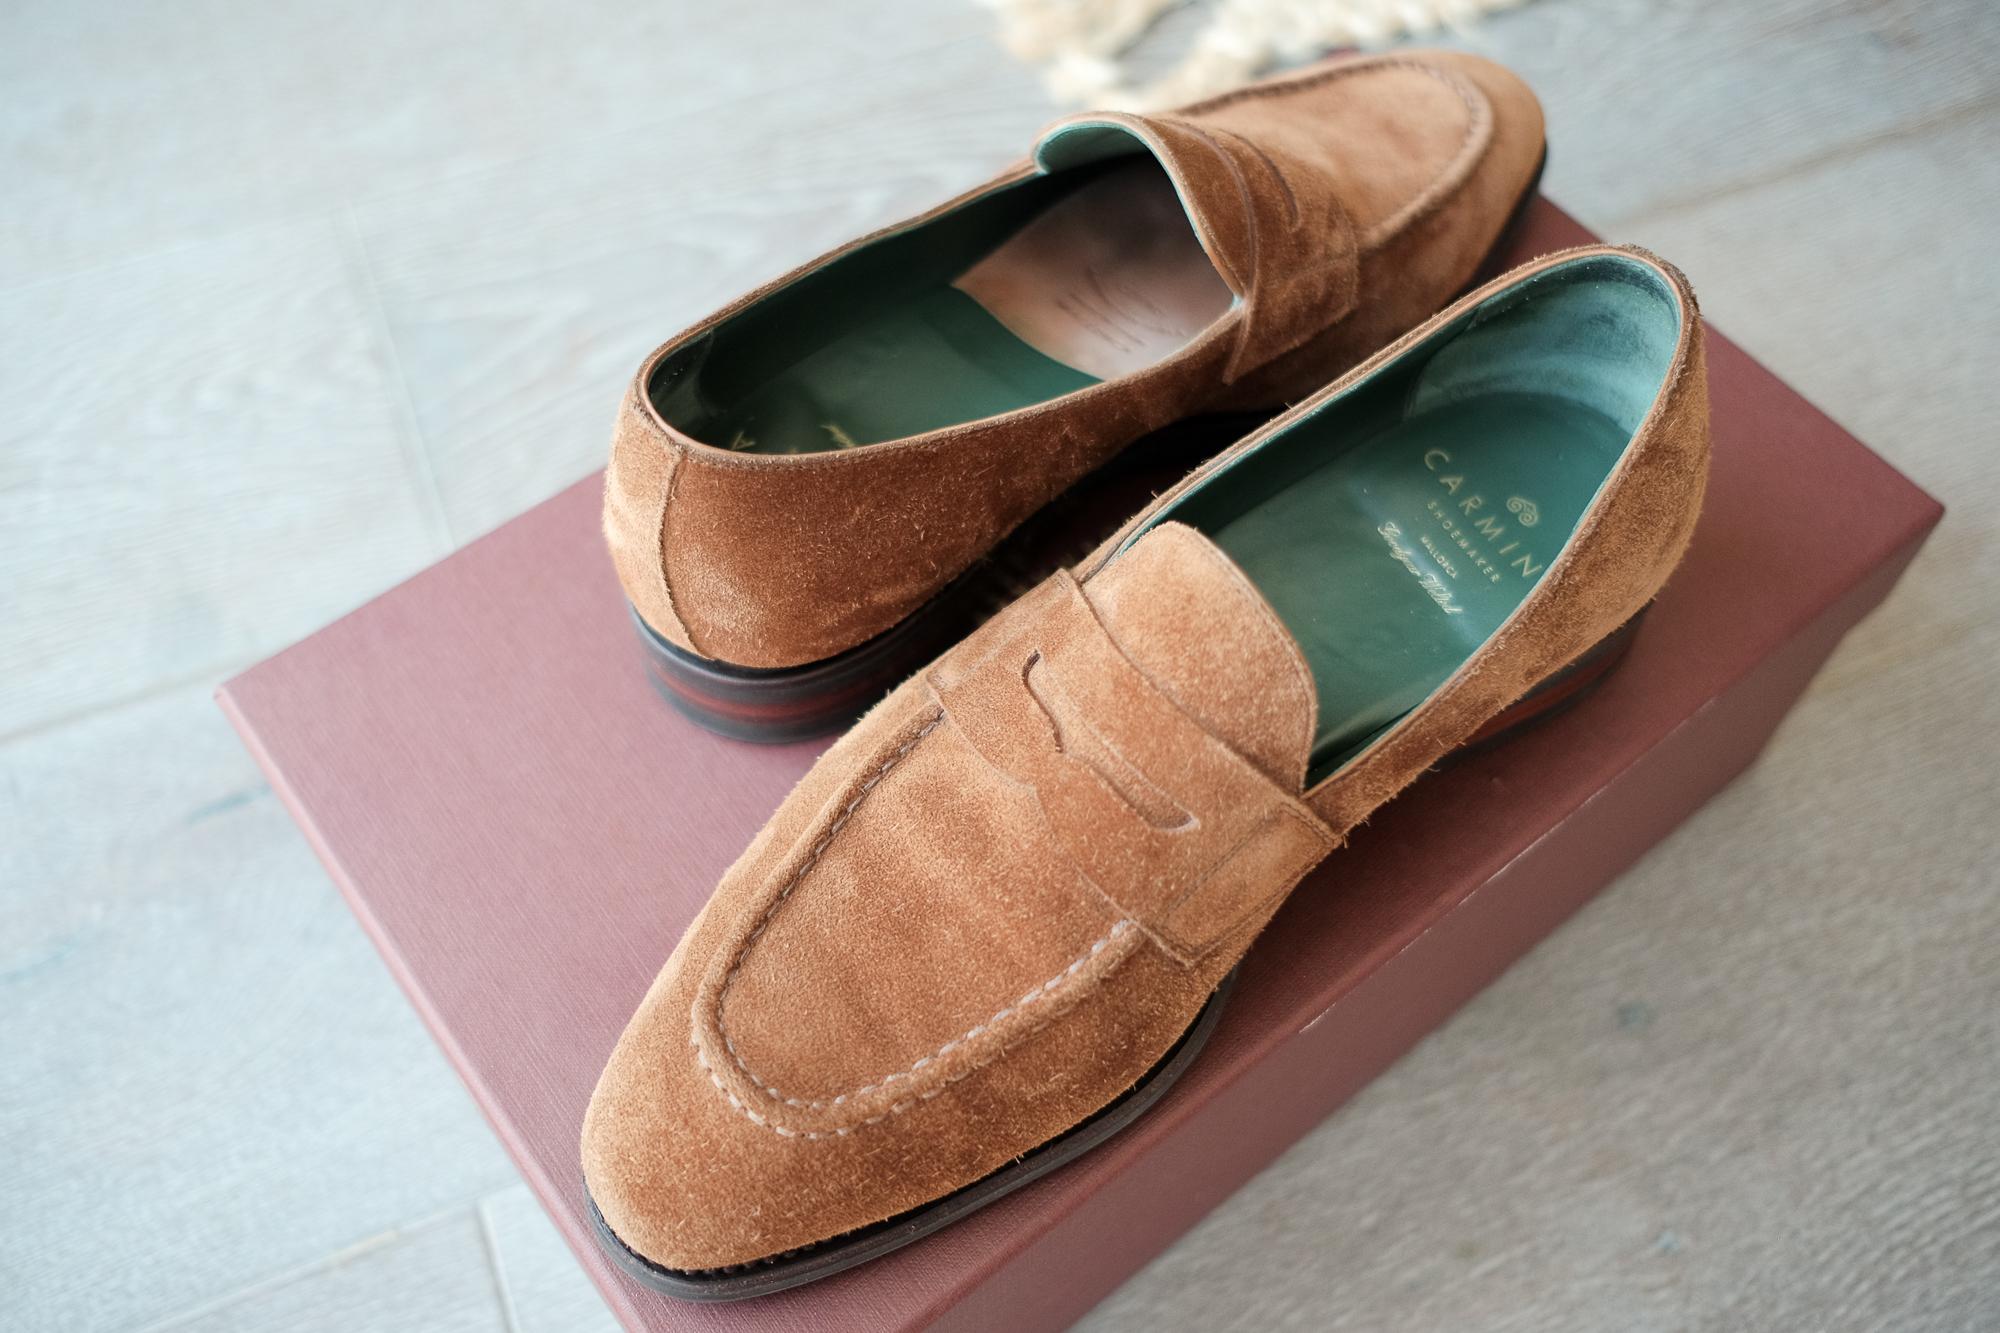 carmina_loafers-7.jpg